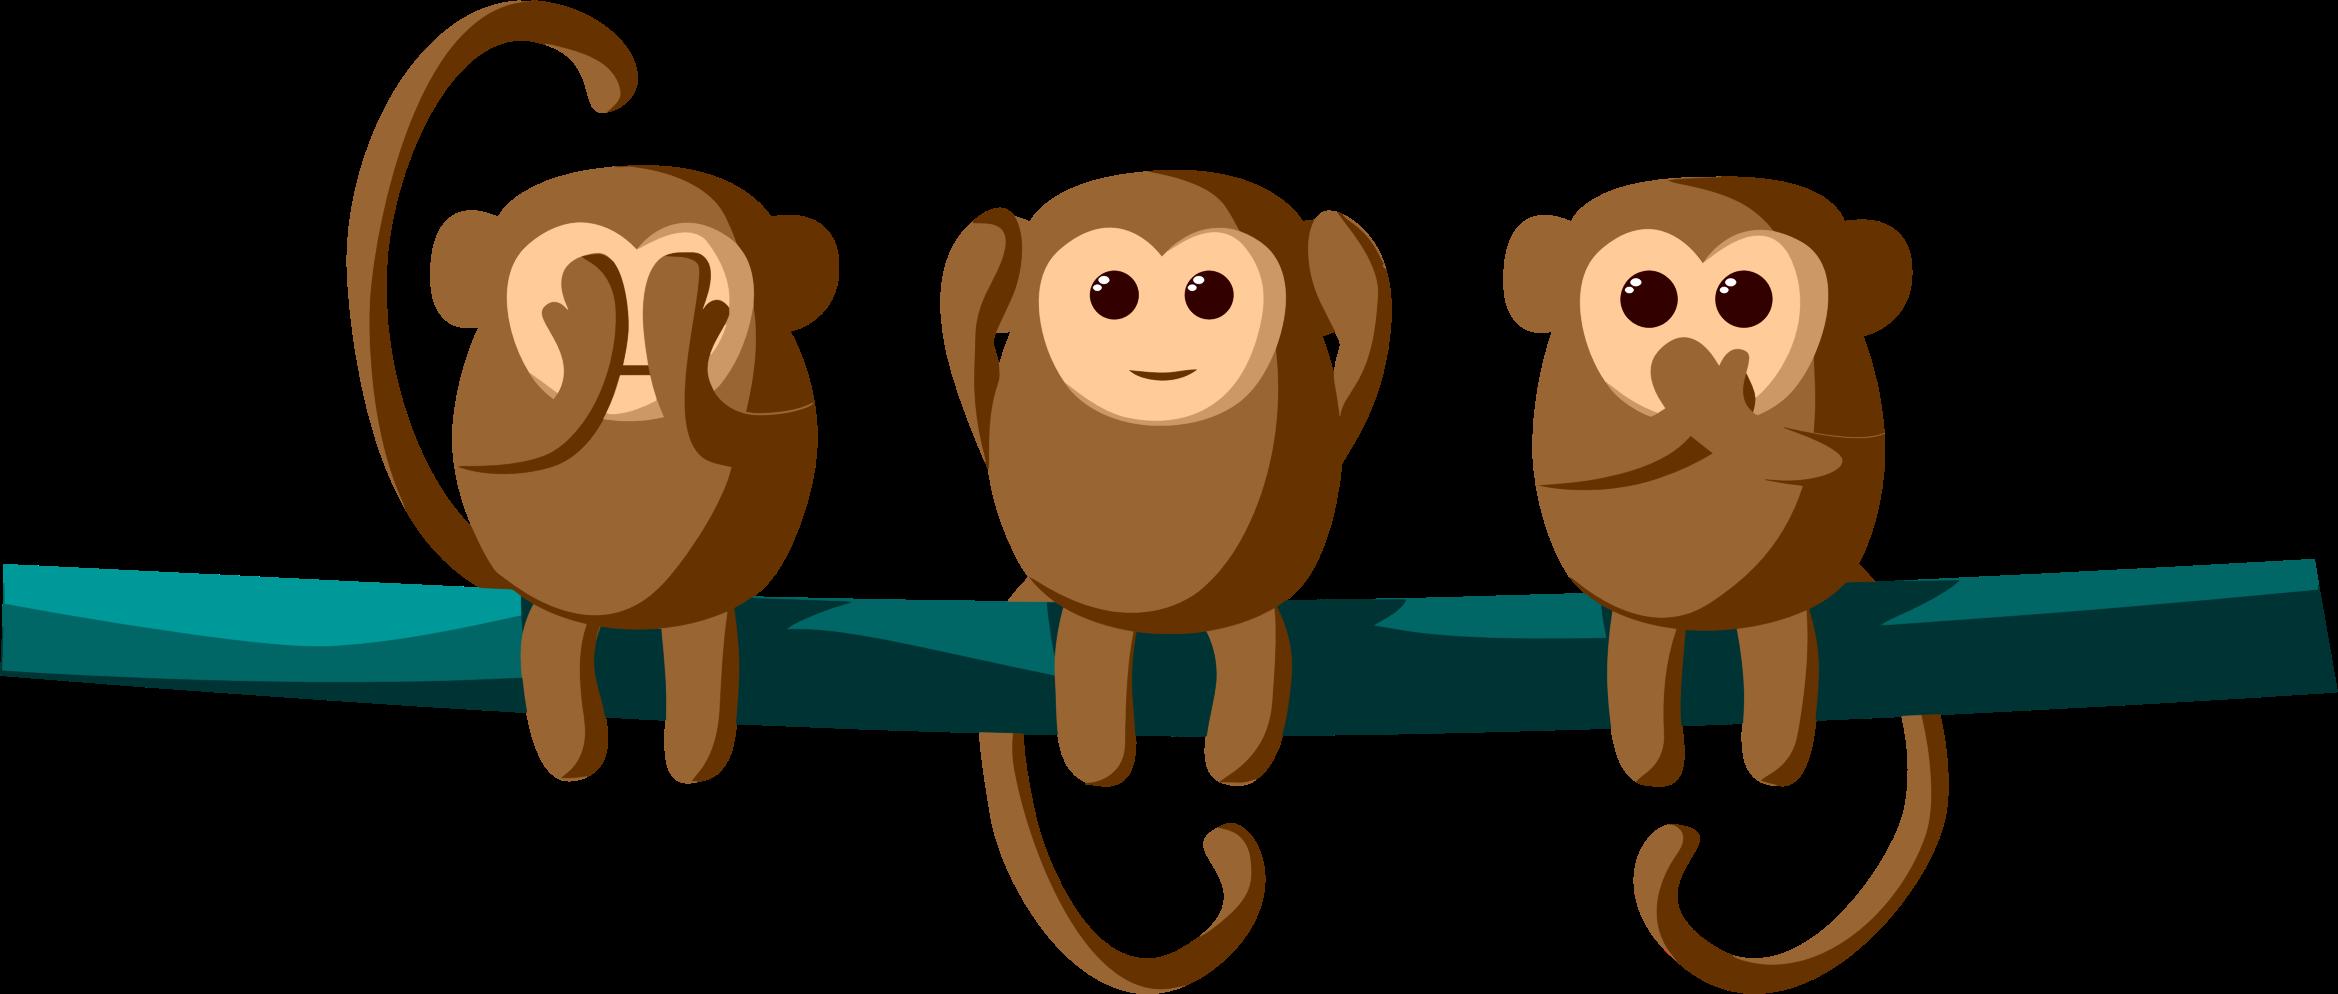 image free stock See speak monkeys big. Hear clipart